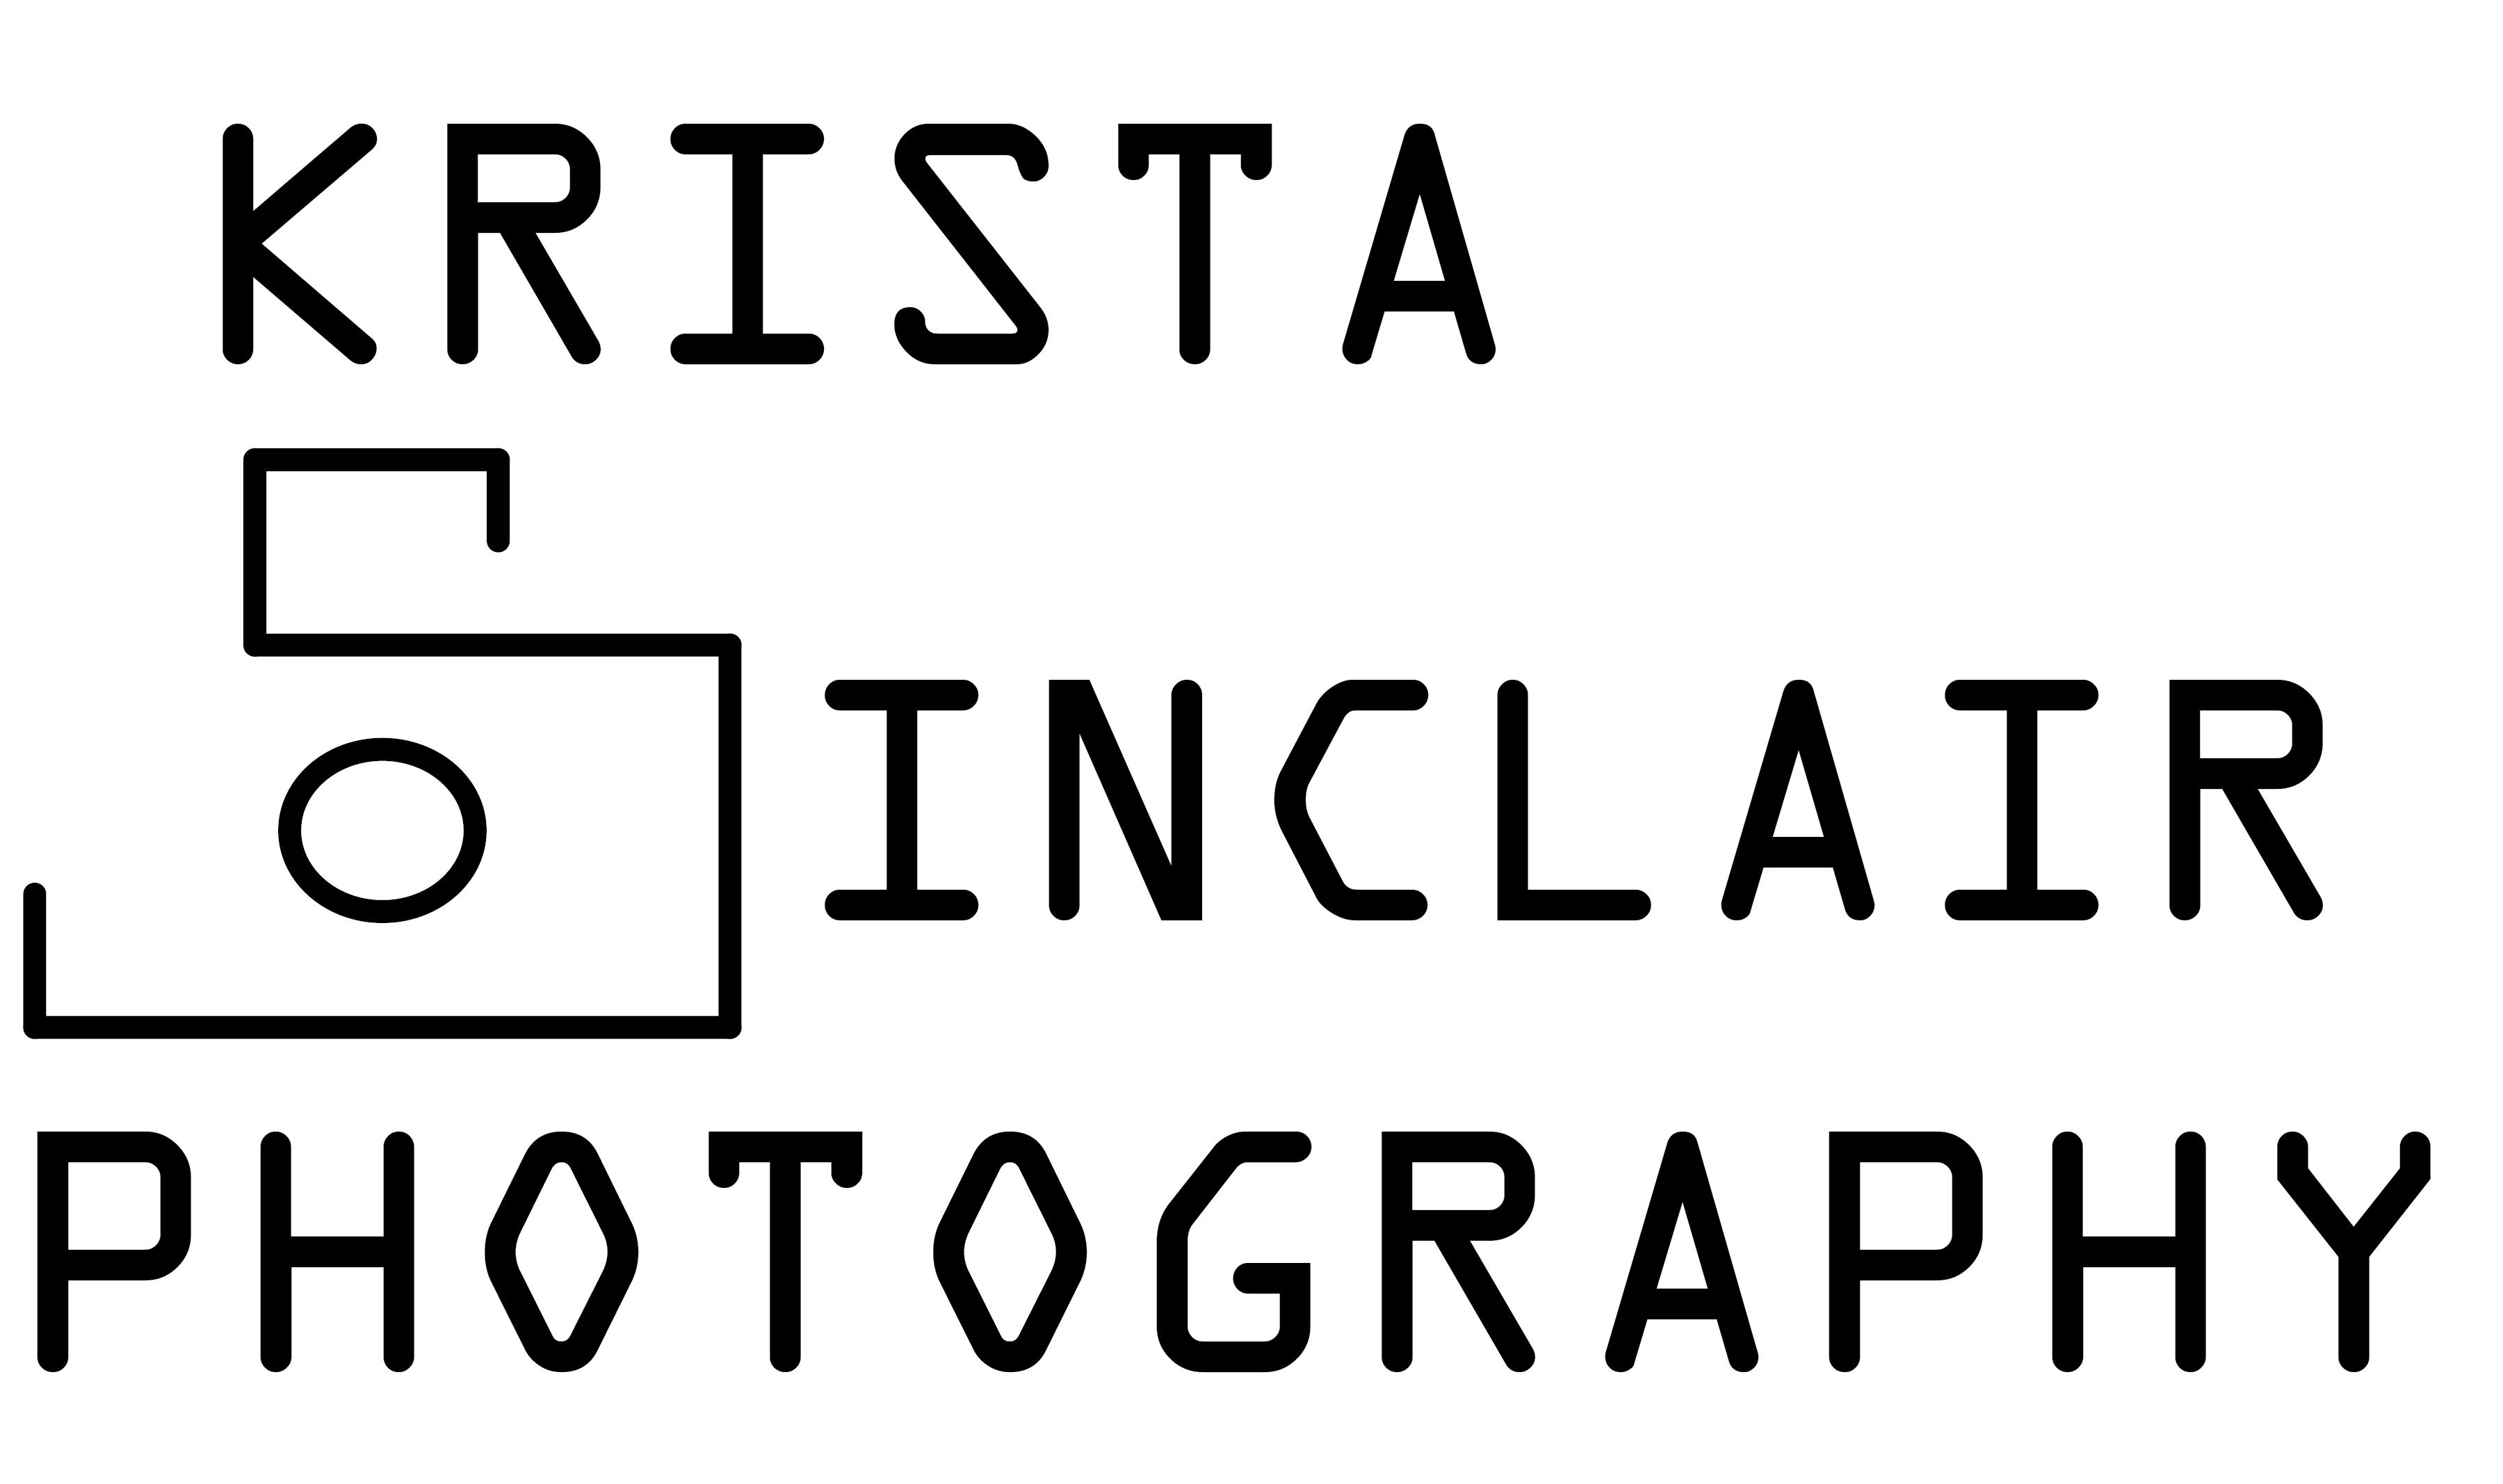 Krista Sinclair Photography